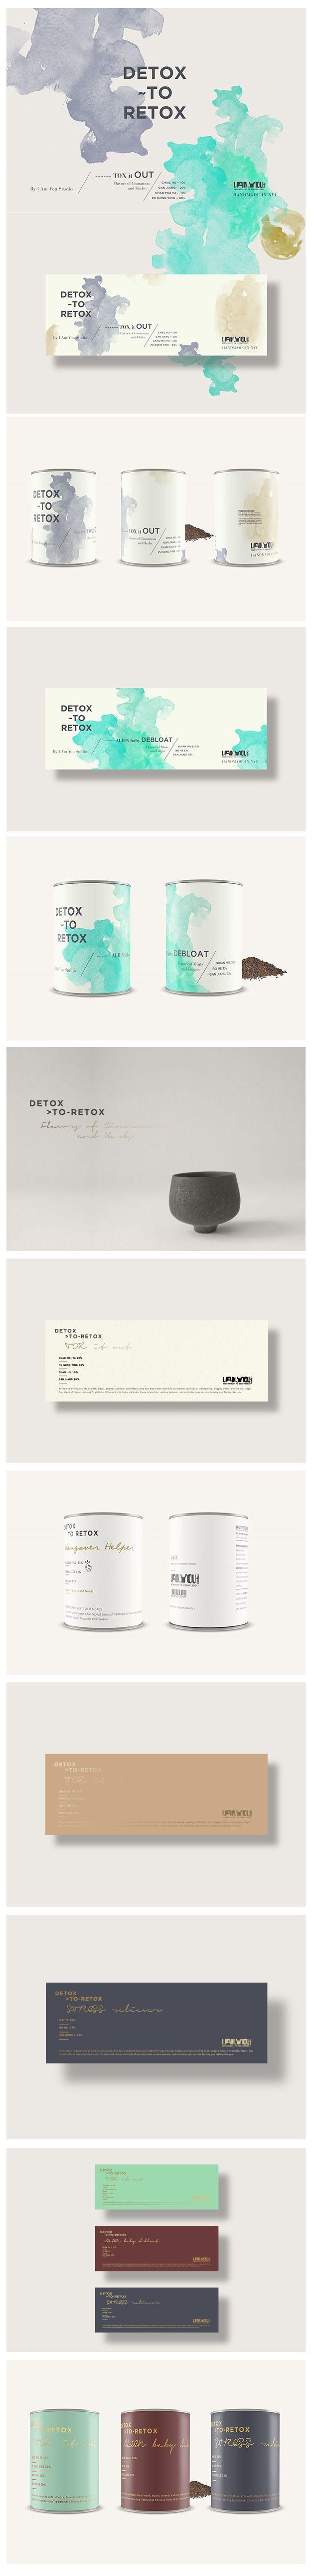 Detox to Retox. #branding #packaging #design